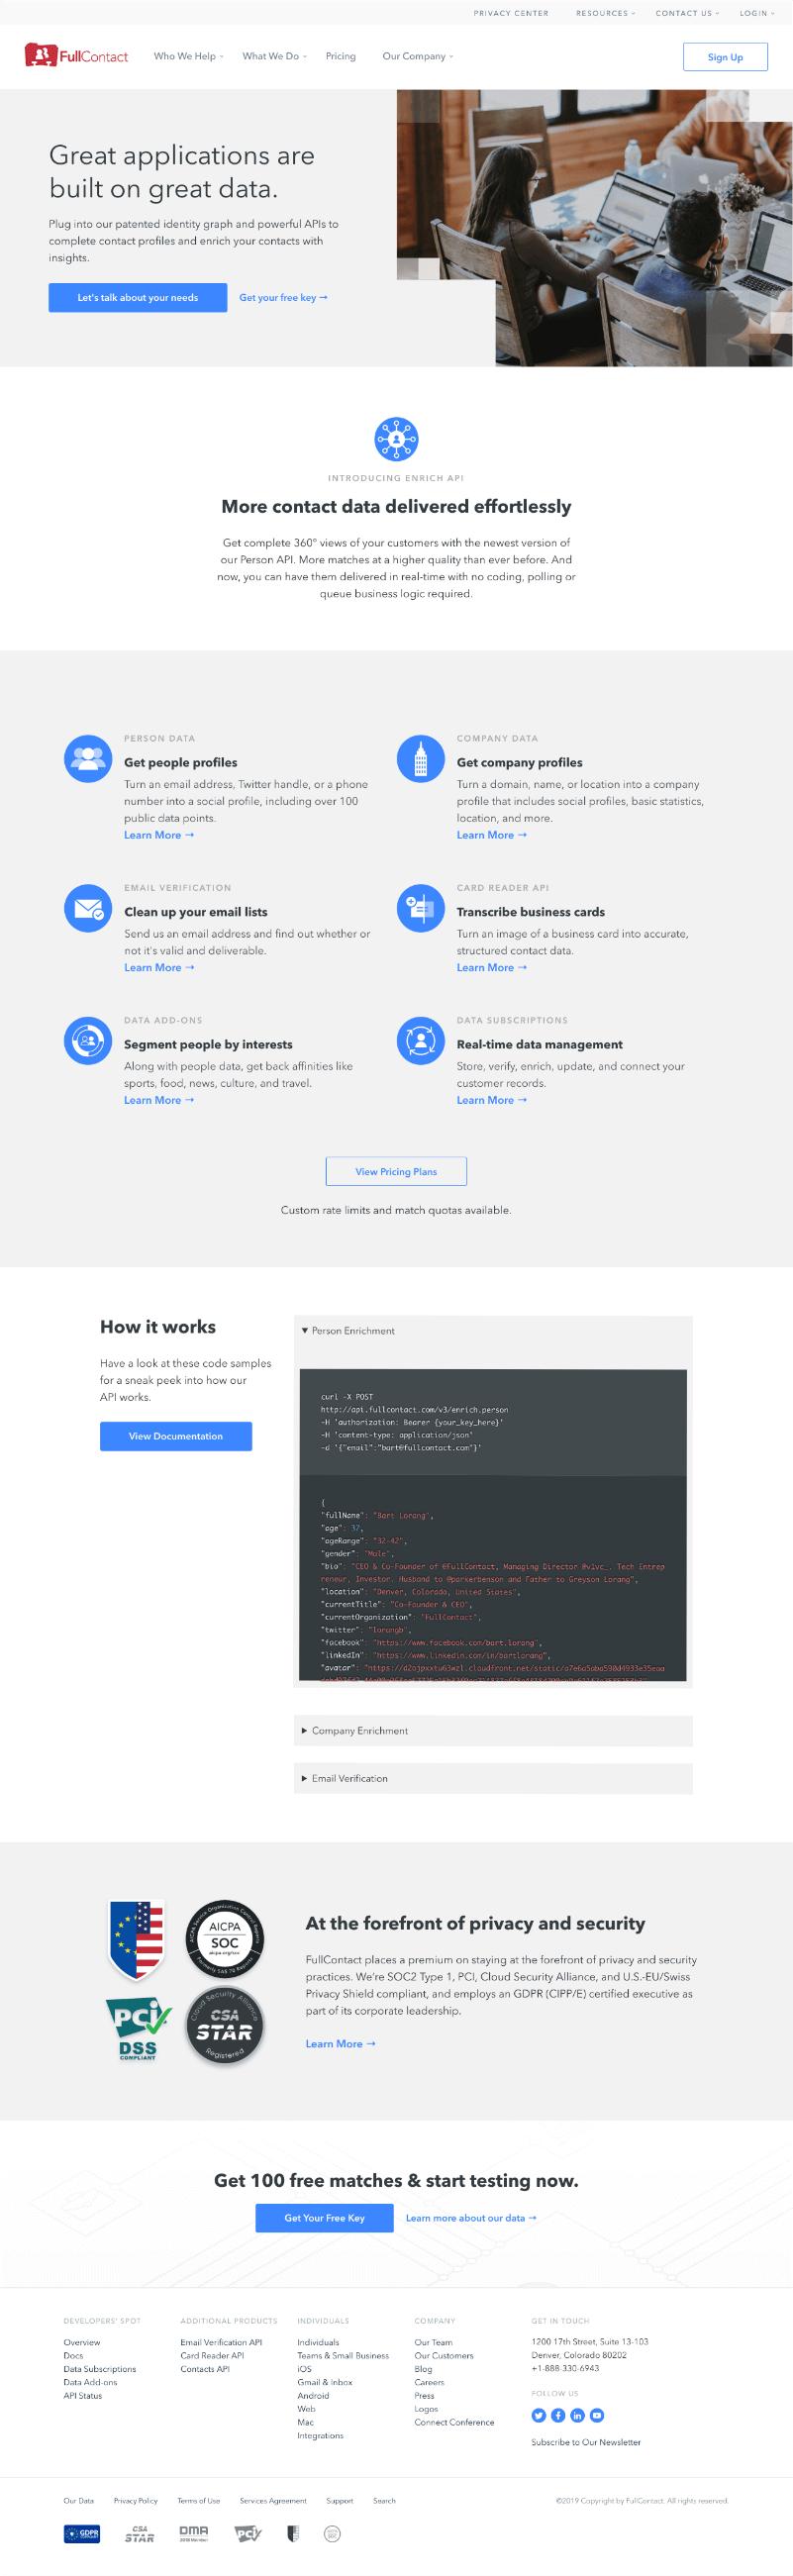 developer-spot.png